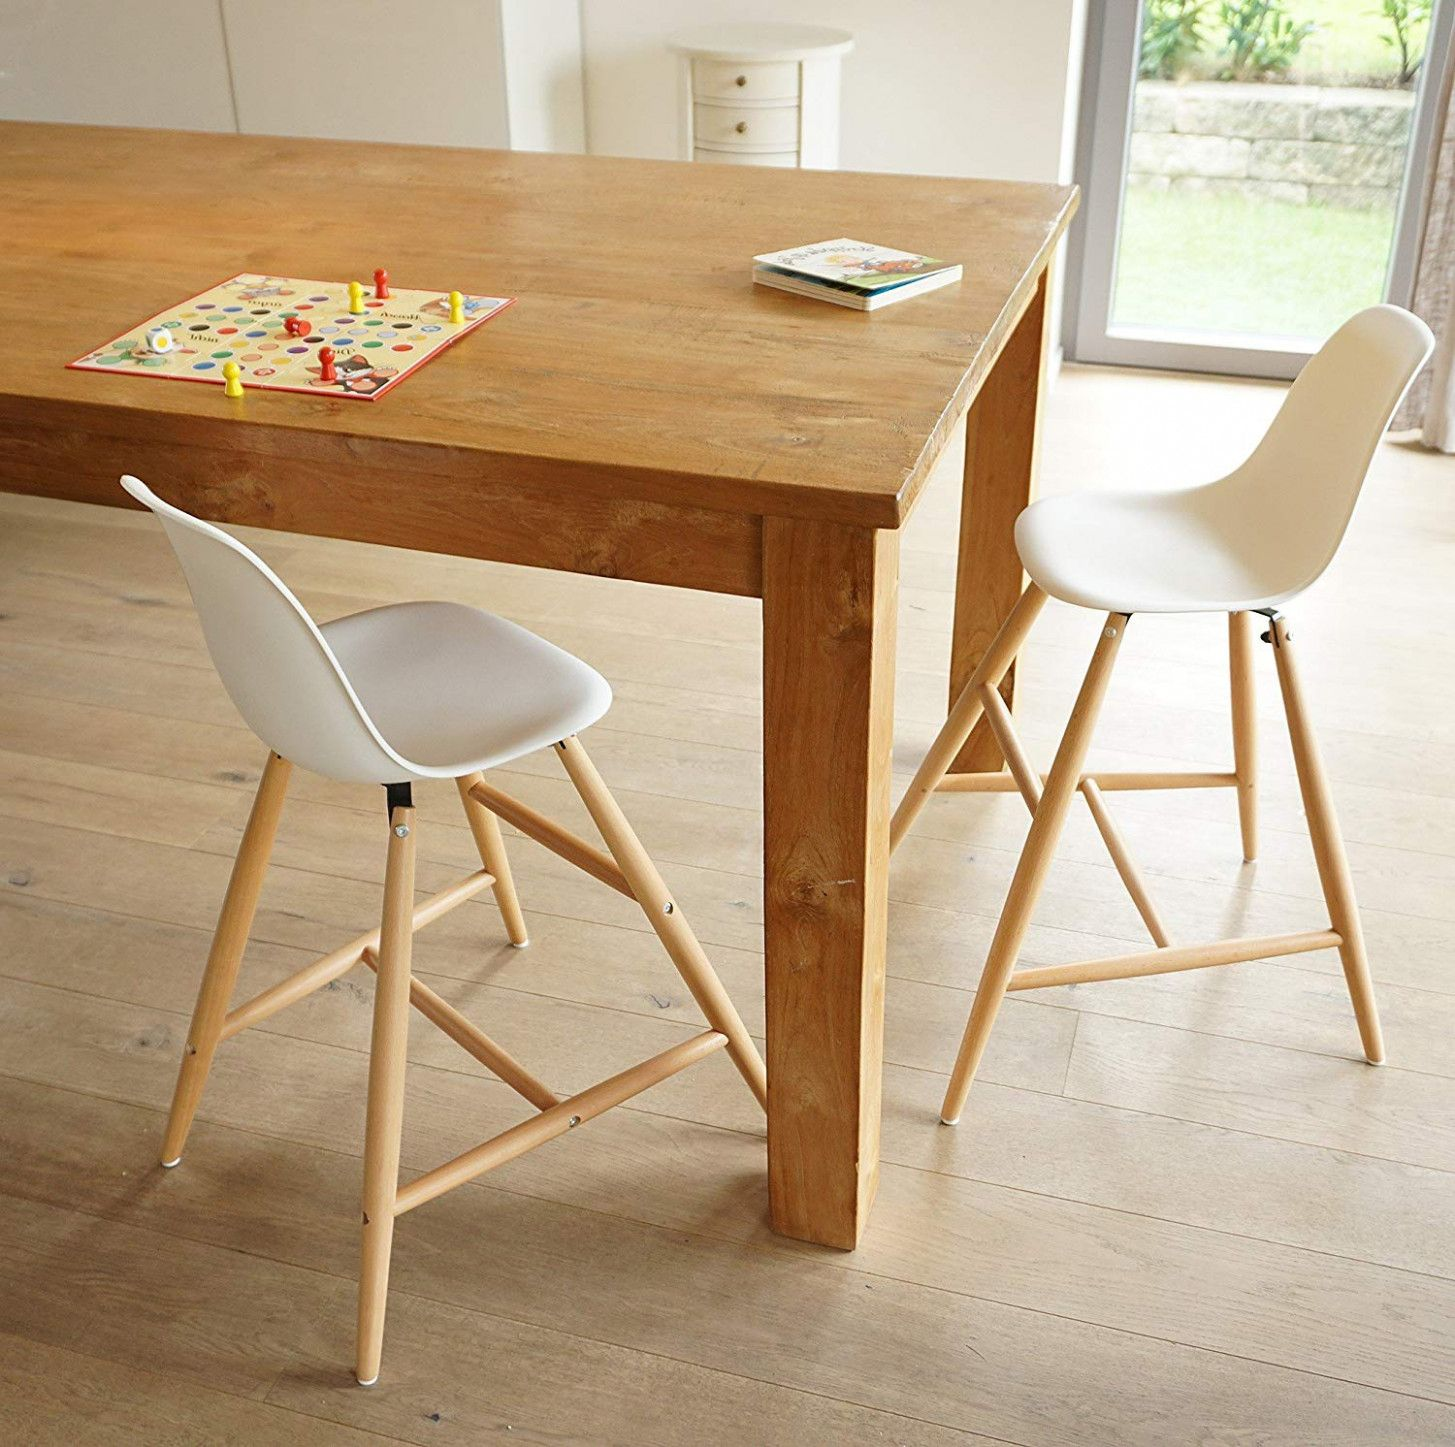 Pin By Ara Vitta On Kuchentisch Dining Chairs Chair Furniture